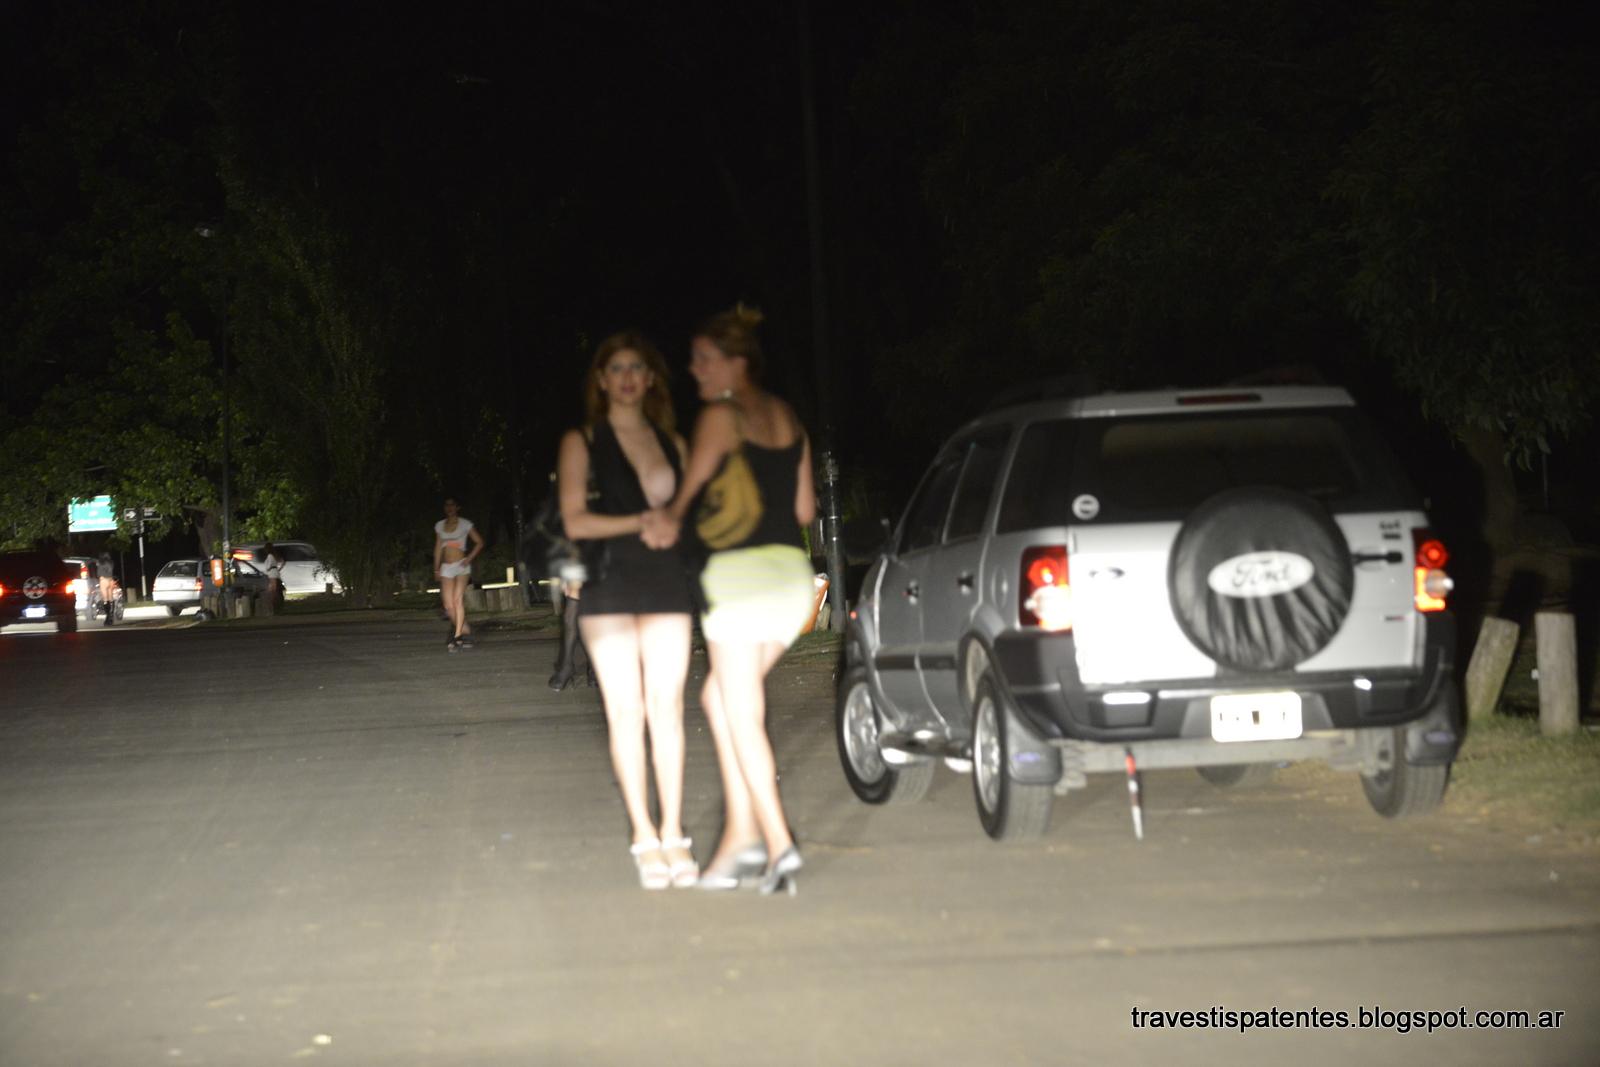 sexo oral sin proteccion prostitutas porcentaje hombres prostitutas